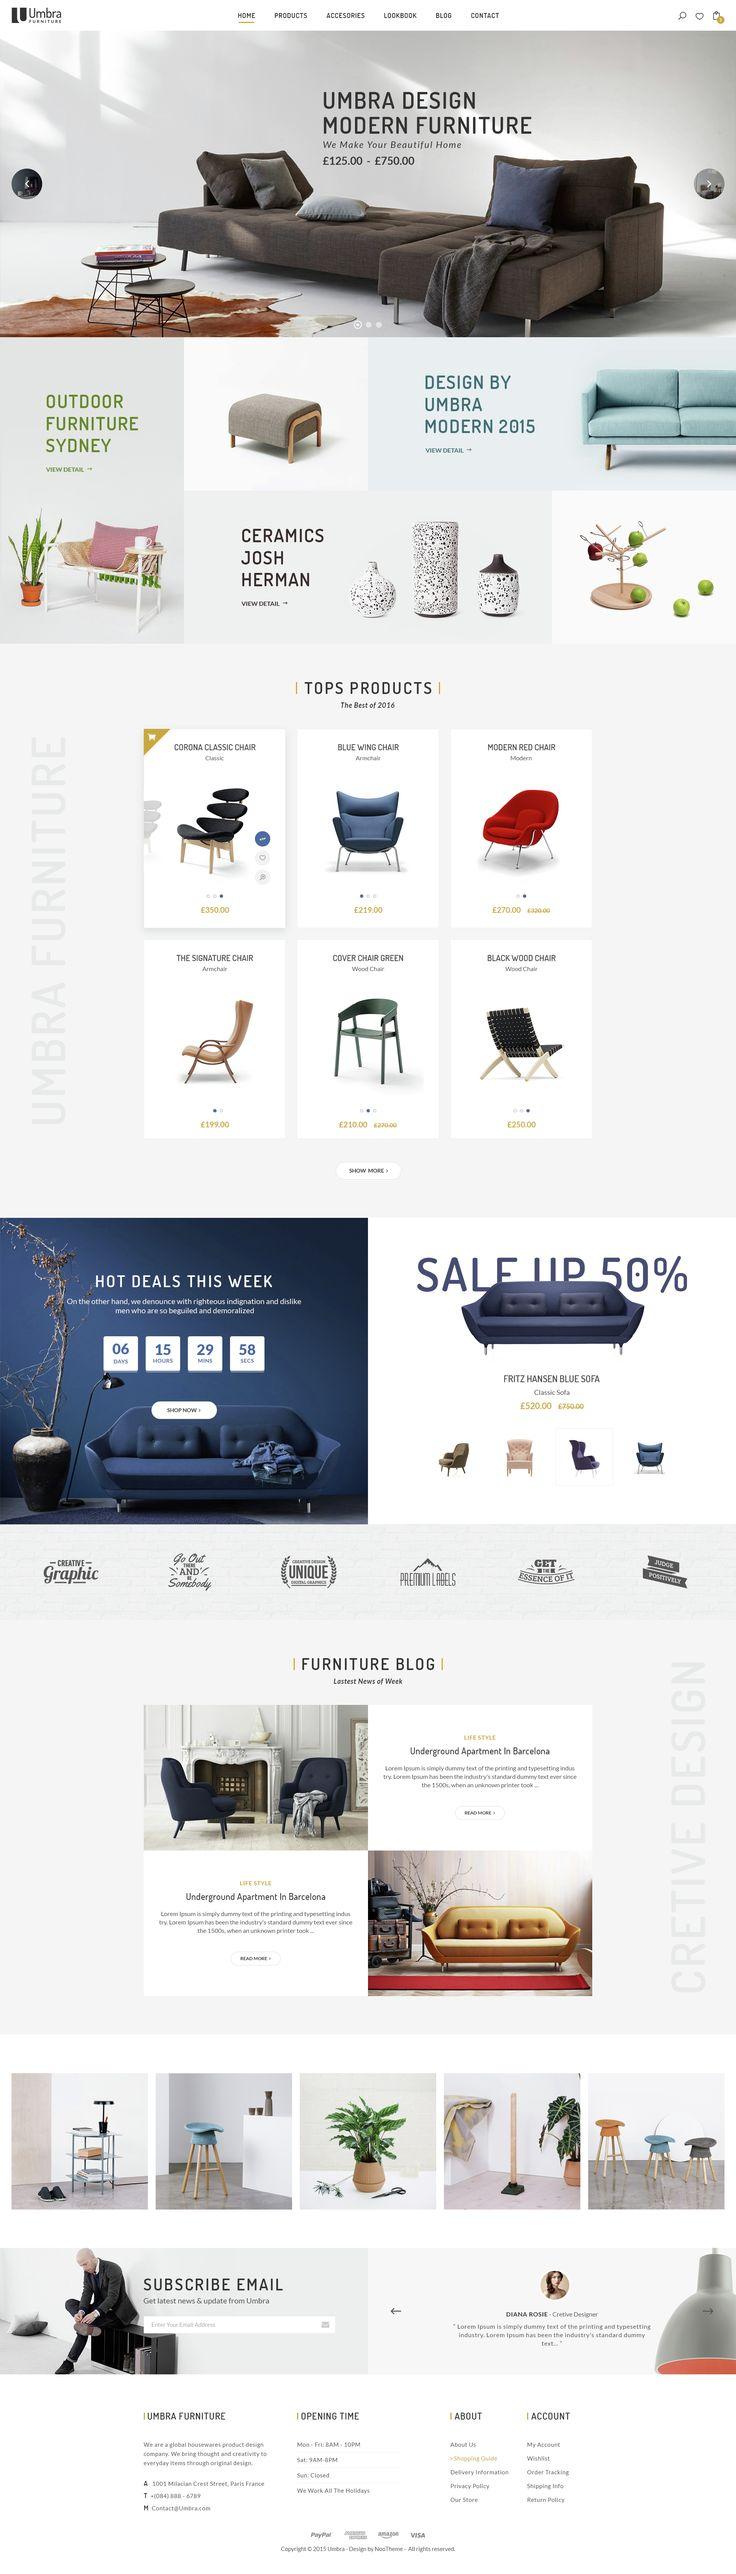 Best 25+ Ecommerce web design ideas on Pinterest | Web design ...